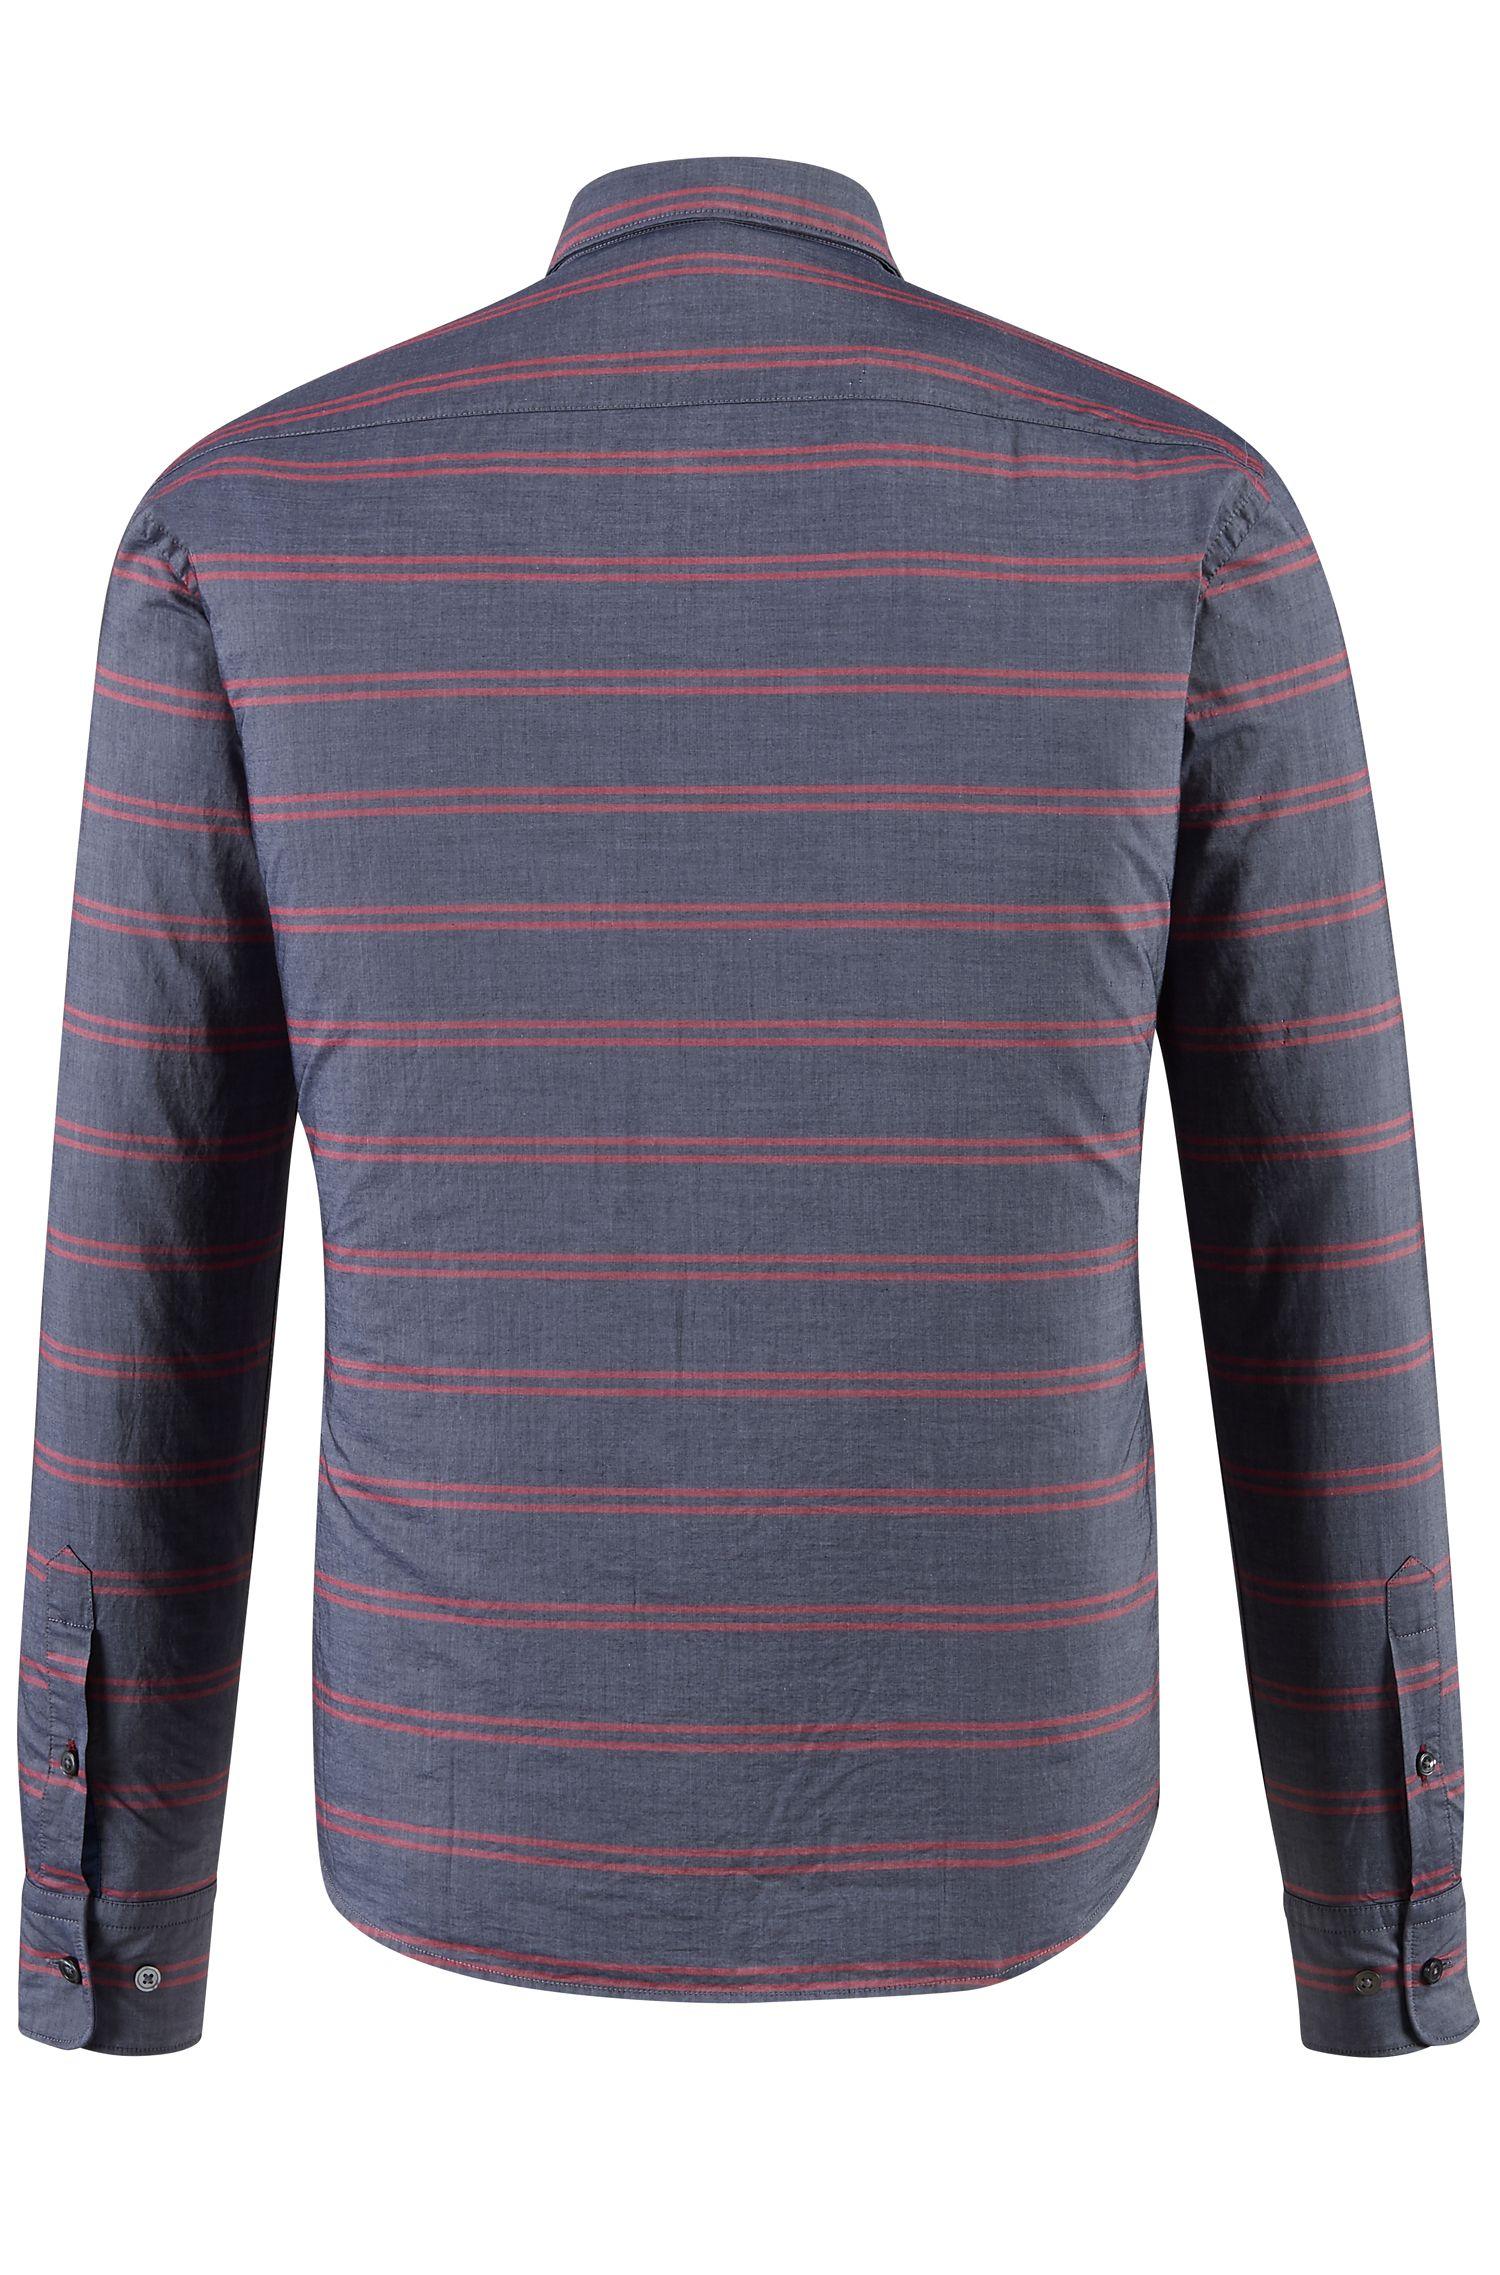 Striped Cotton Button Down Shirt, Slim Fit | Reid F, Red